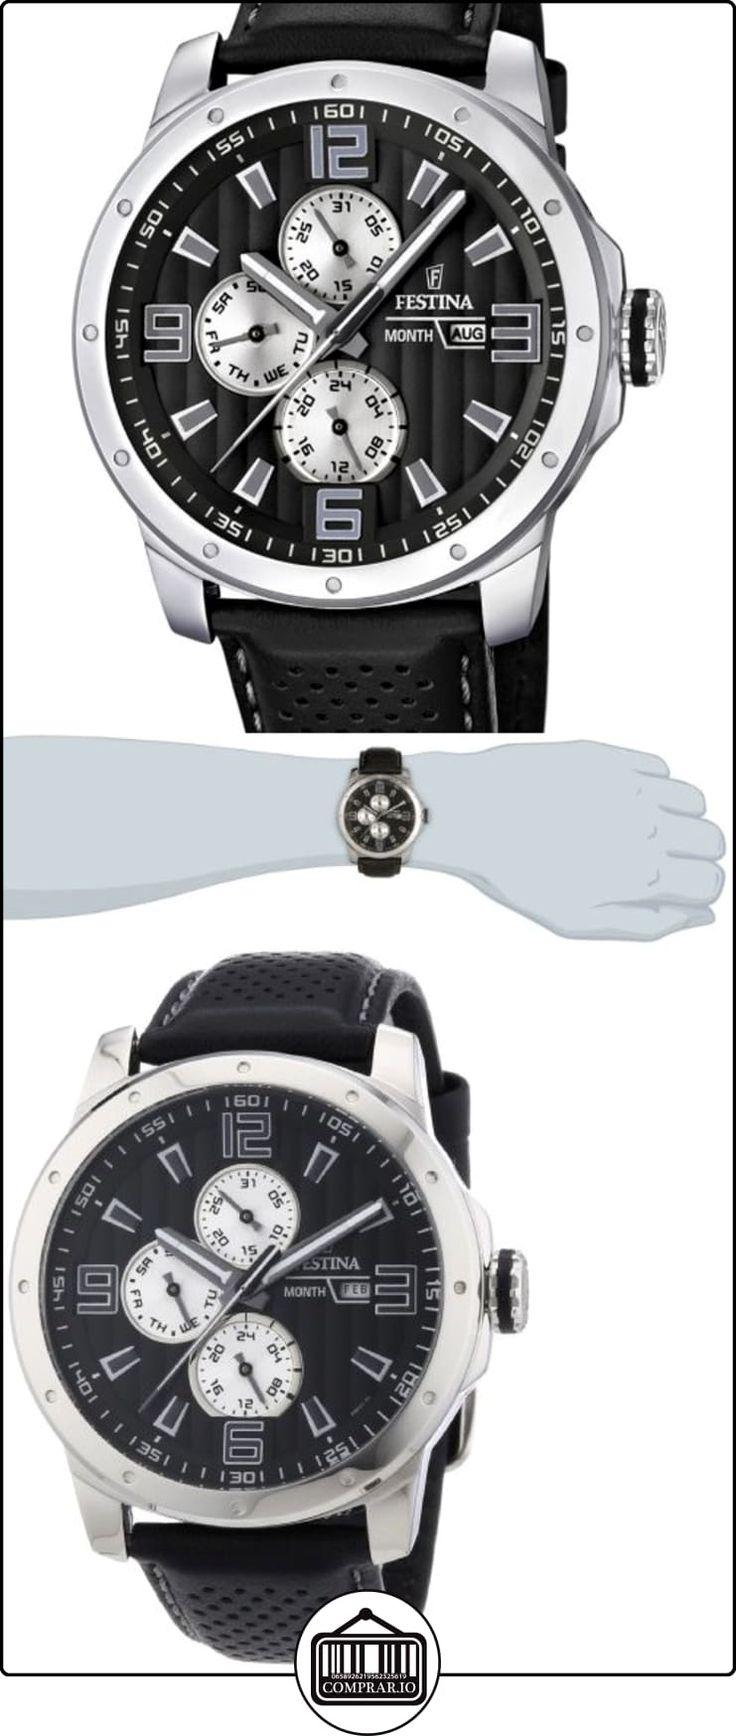 Festina Sport Multifunktion F16585/9 - Reloj analógico de cuarzo para hombre, correa de cuero color negro (agujas luminiscentes)  ✿ Relojes para hombre - (Gama media/alta) ✿